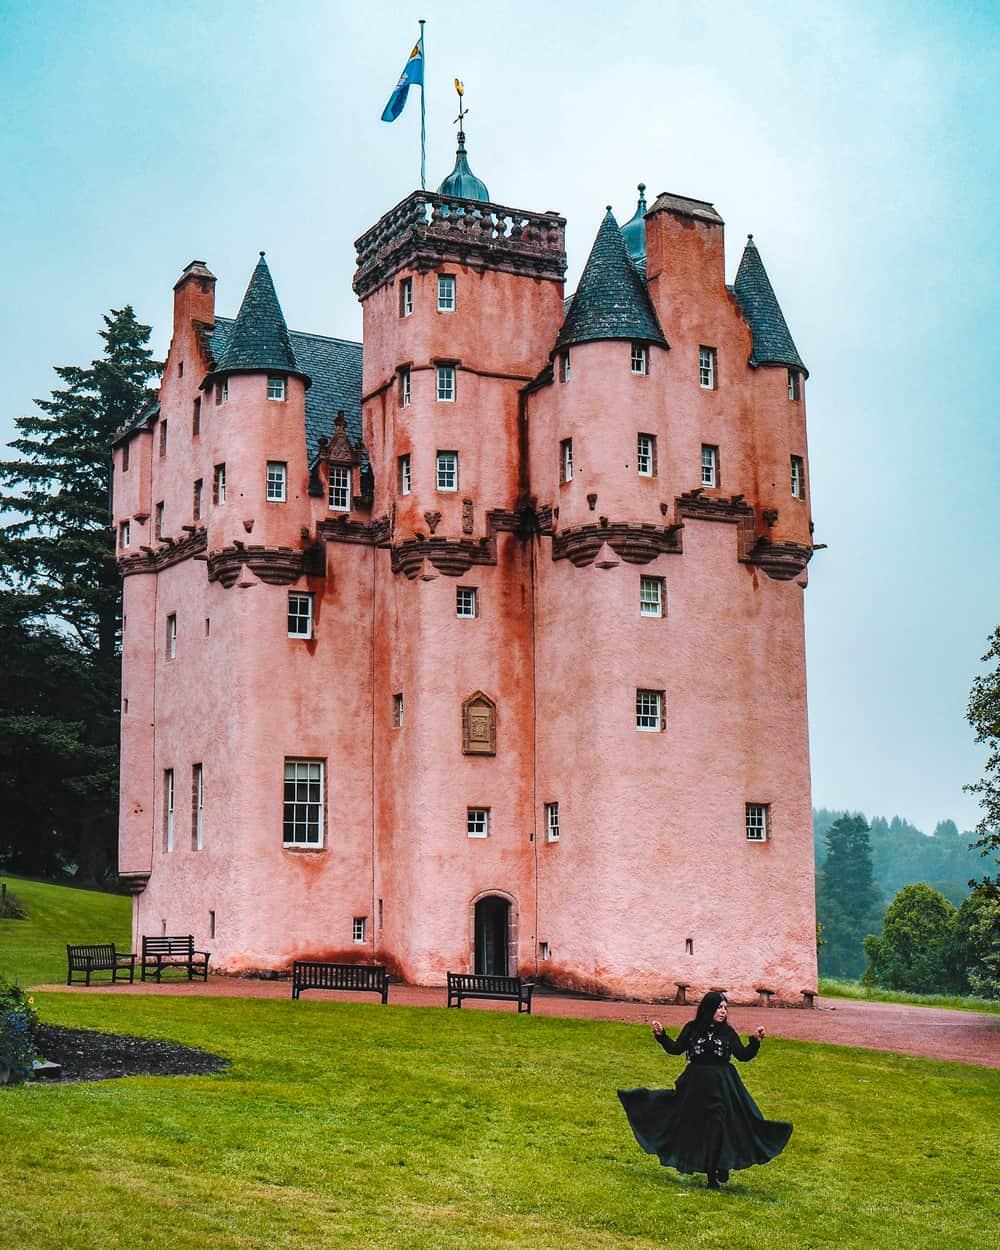 The Pink Castle in Scotland - Craigievar Castle